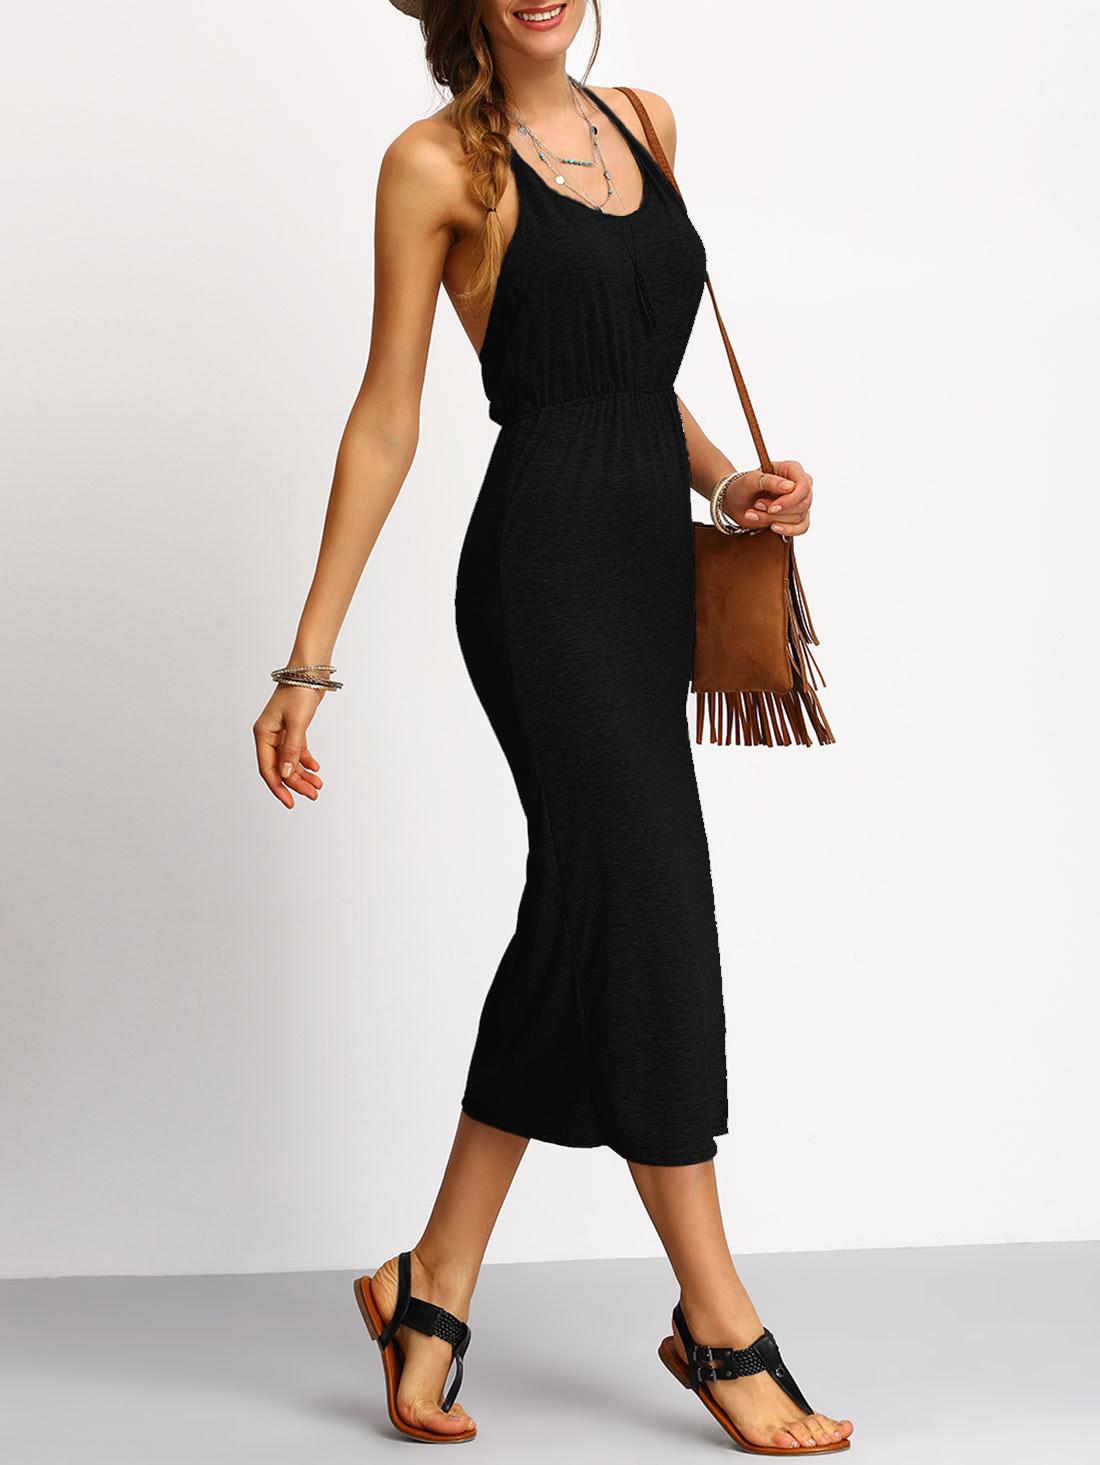 все цены на Halter Backless Slit Pencil Dress